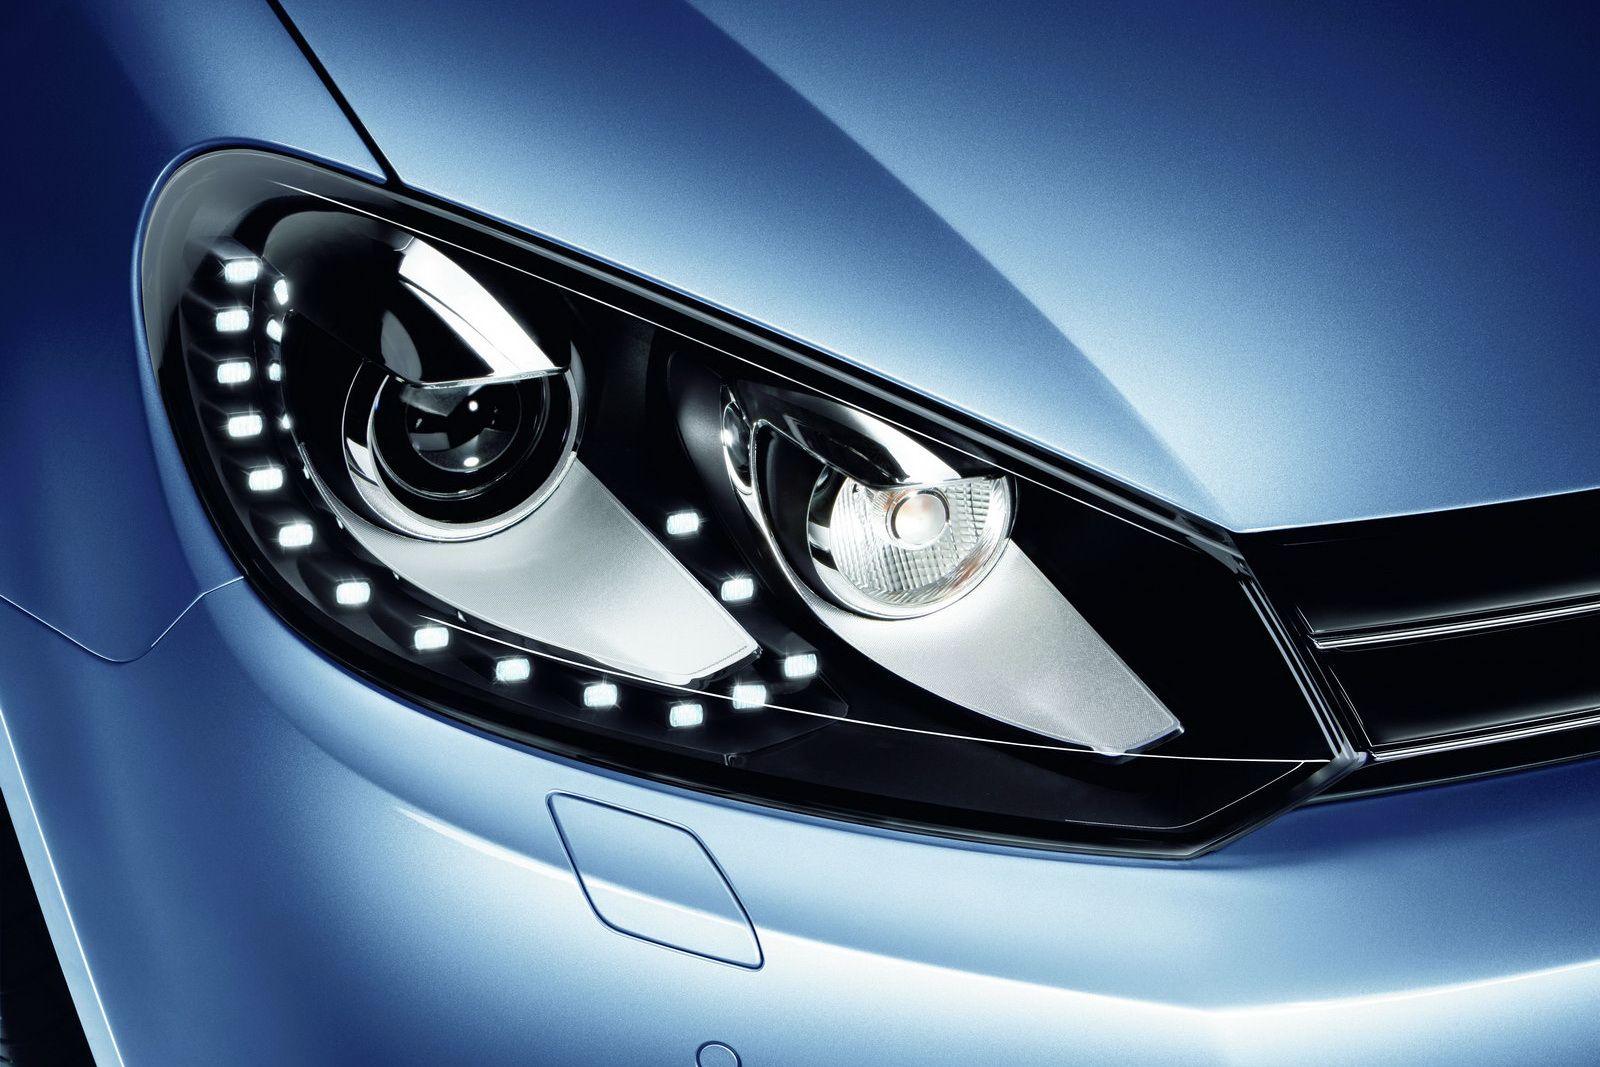 Mk6 Golf OEM LED DRL Headlights | VDub | Volkswagen golf